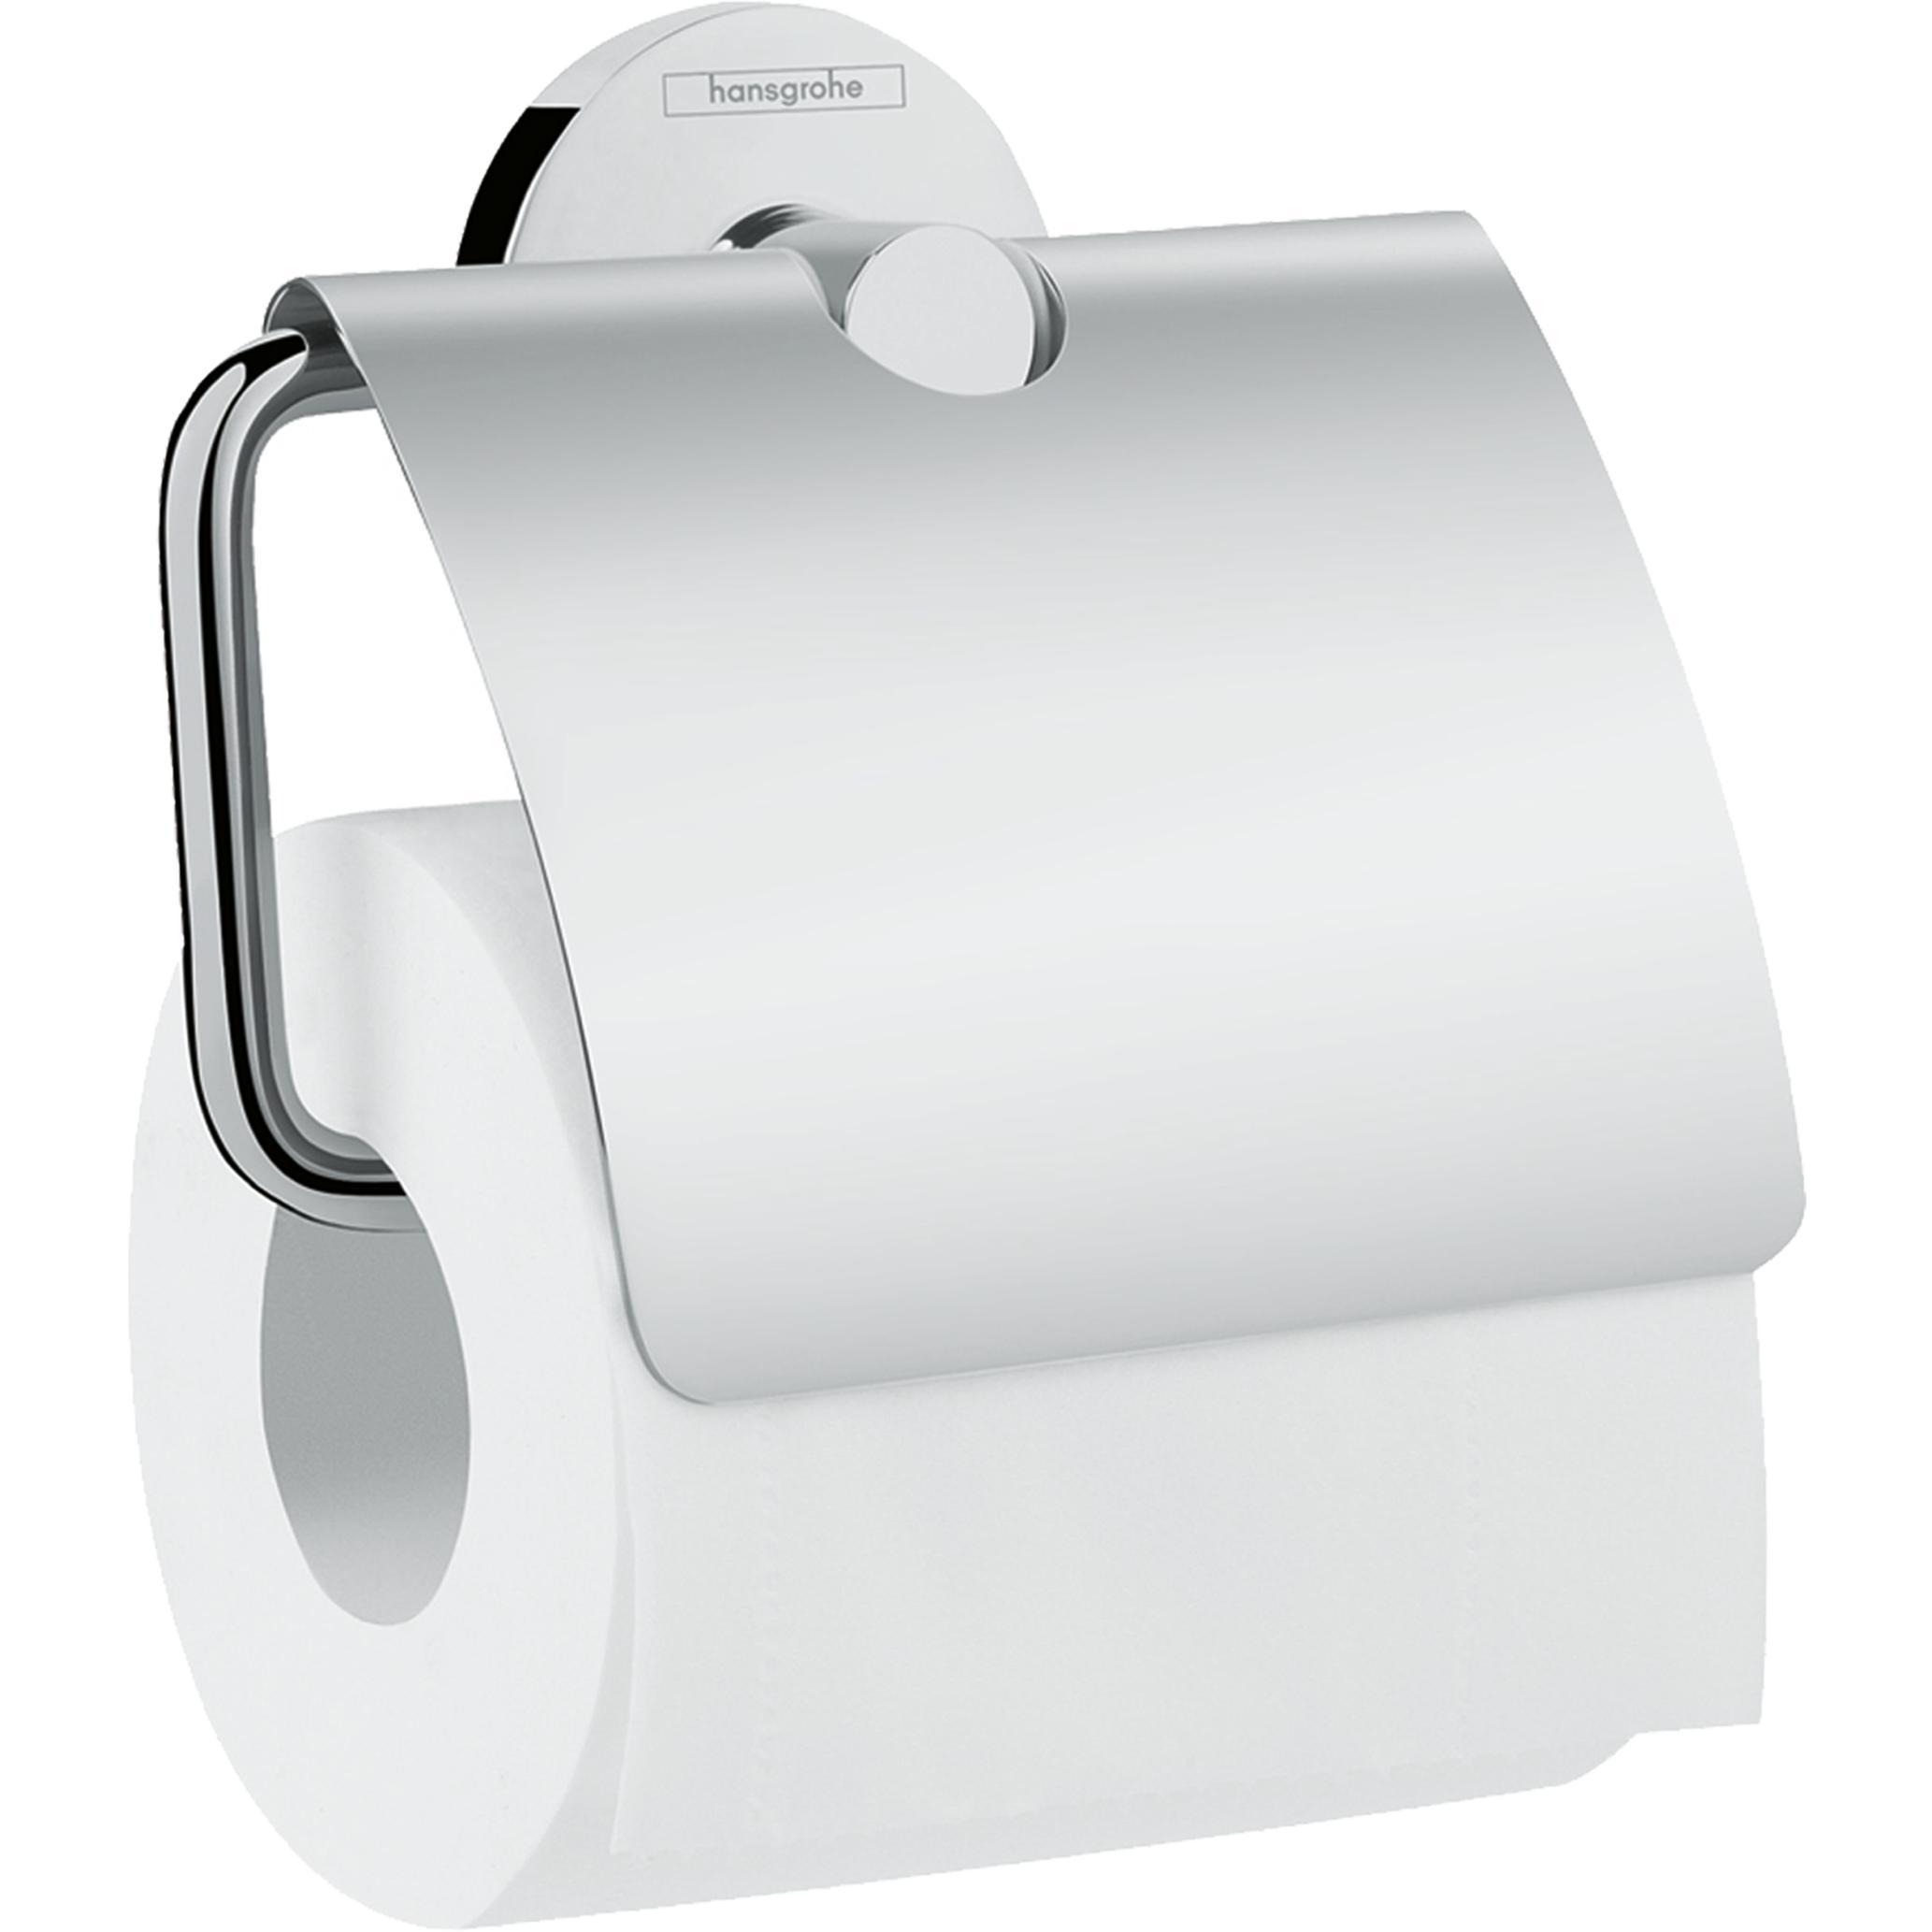 Toalettpappershållare Hansgrohe Logis Krom 138